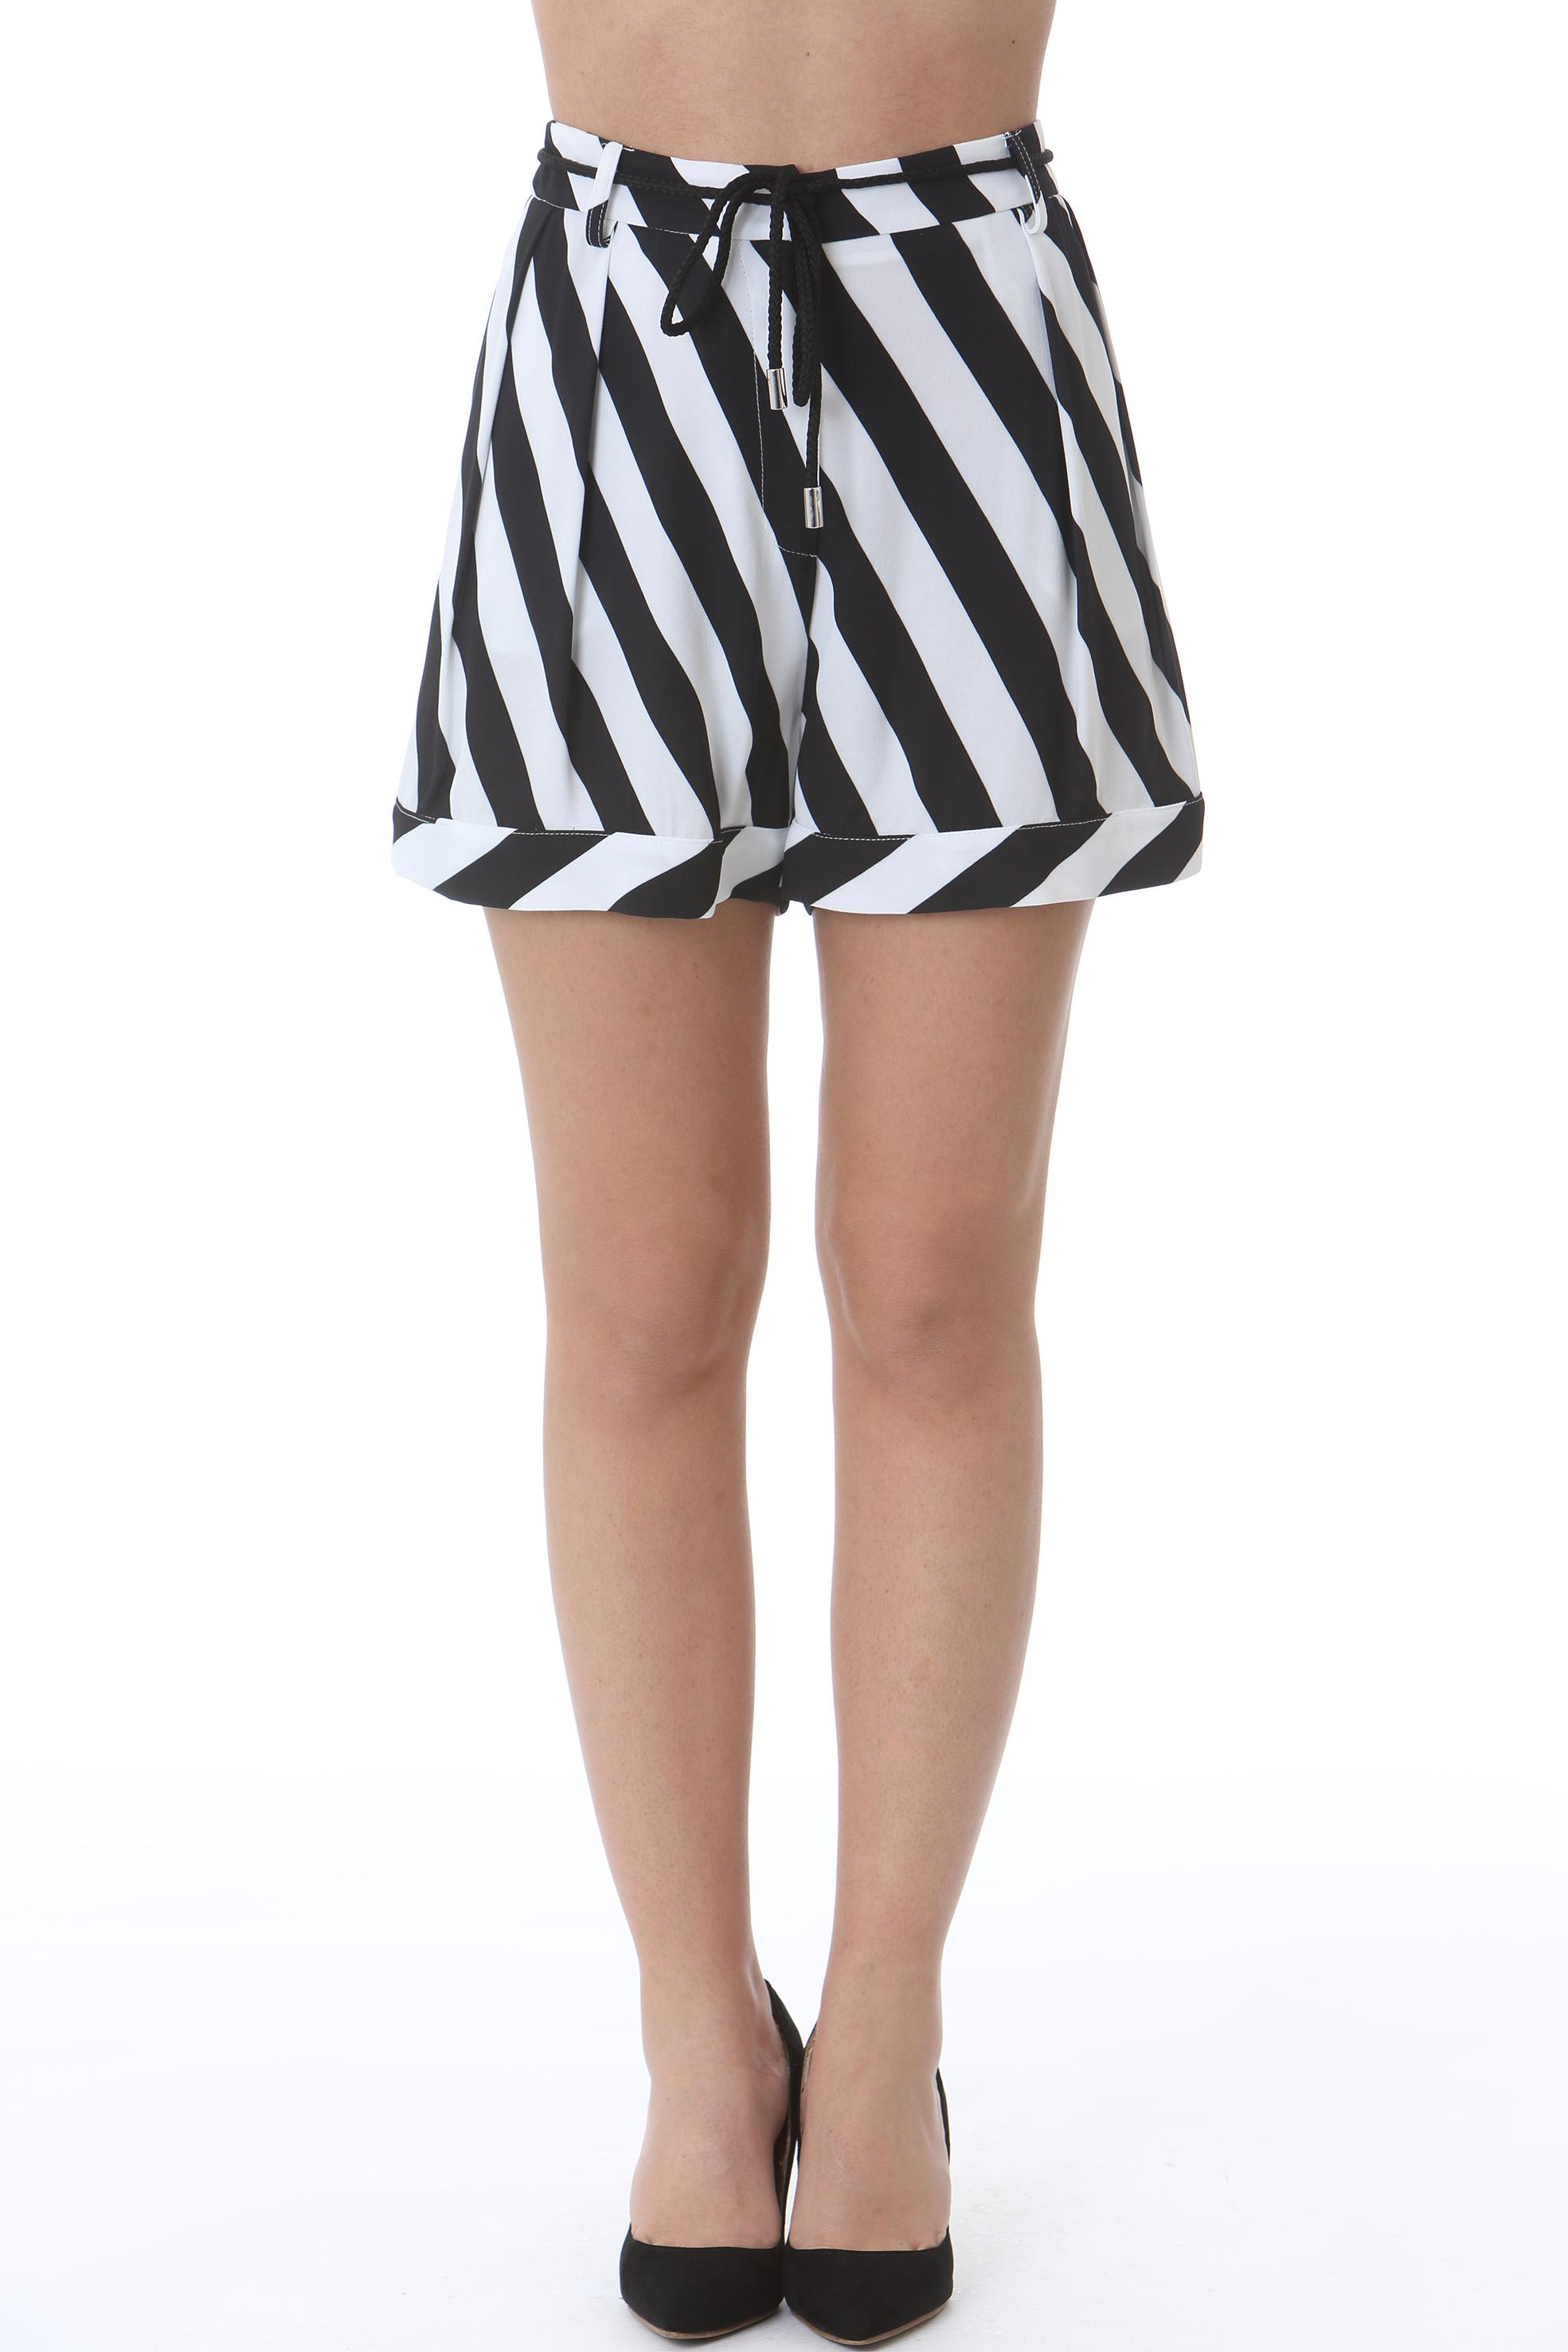 SHORTS RIGATO MANILA GRACE | Shorts | P039VIMA028